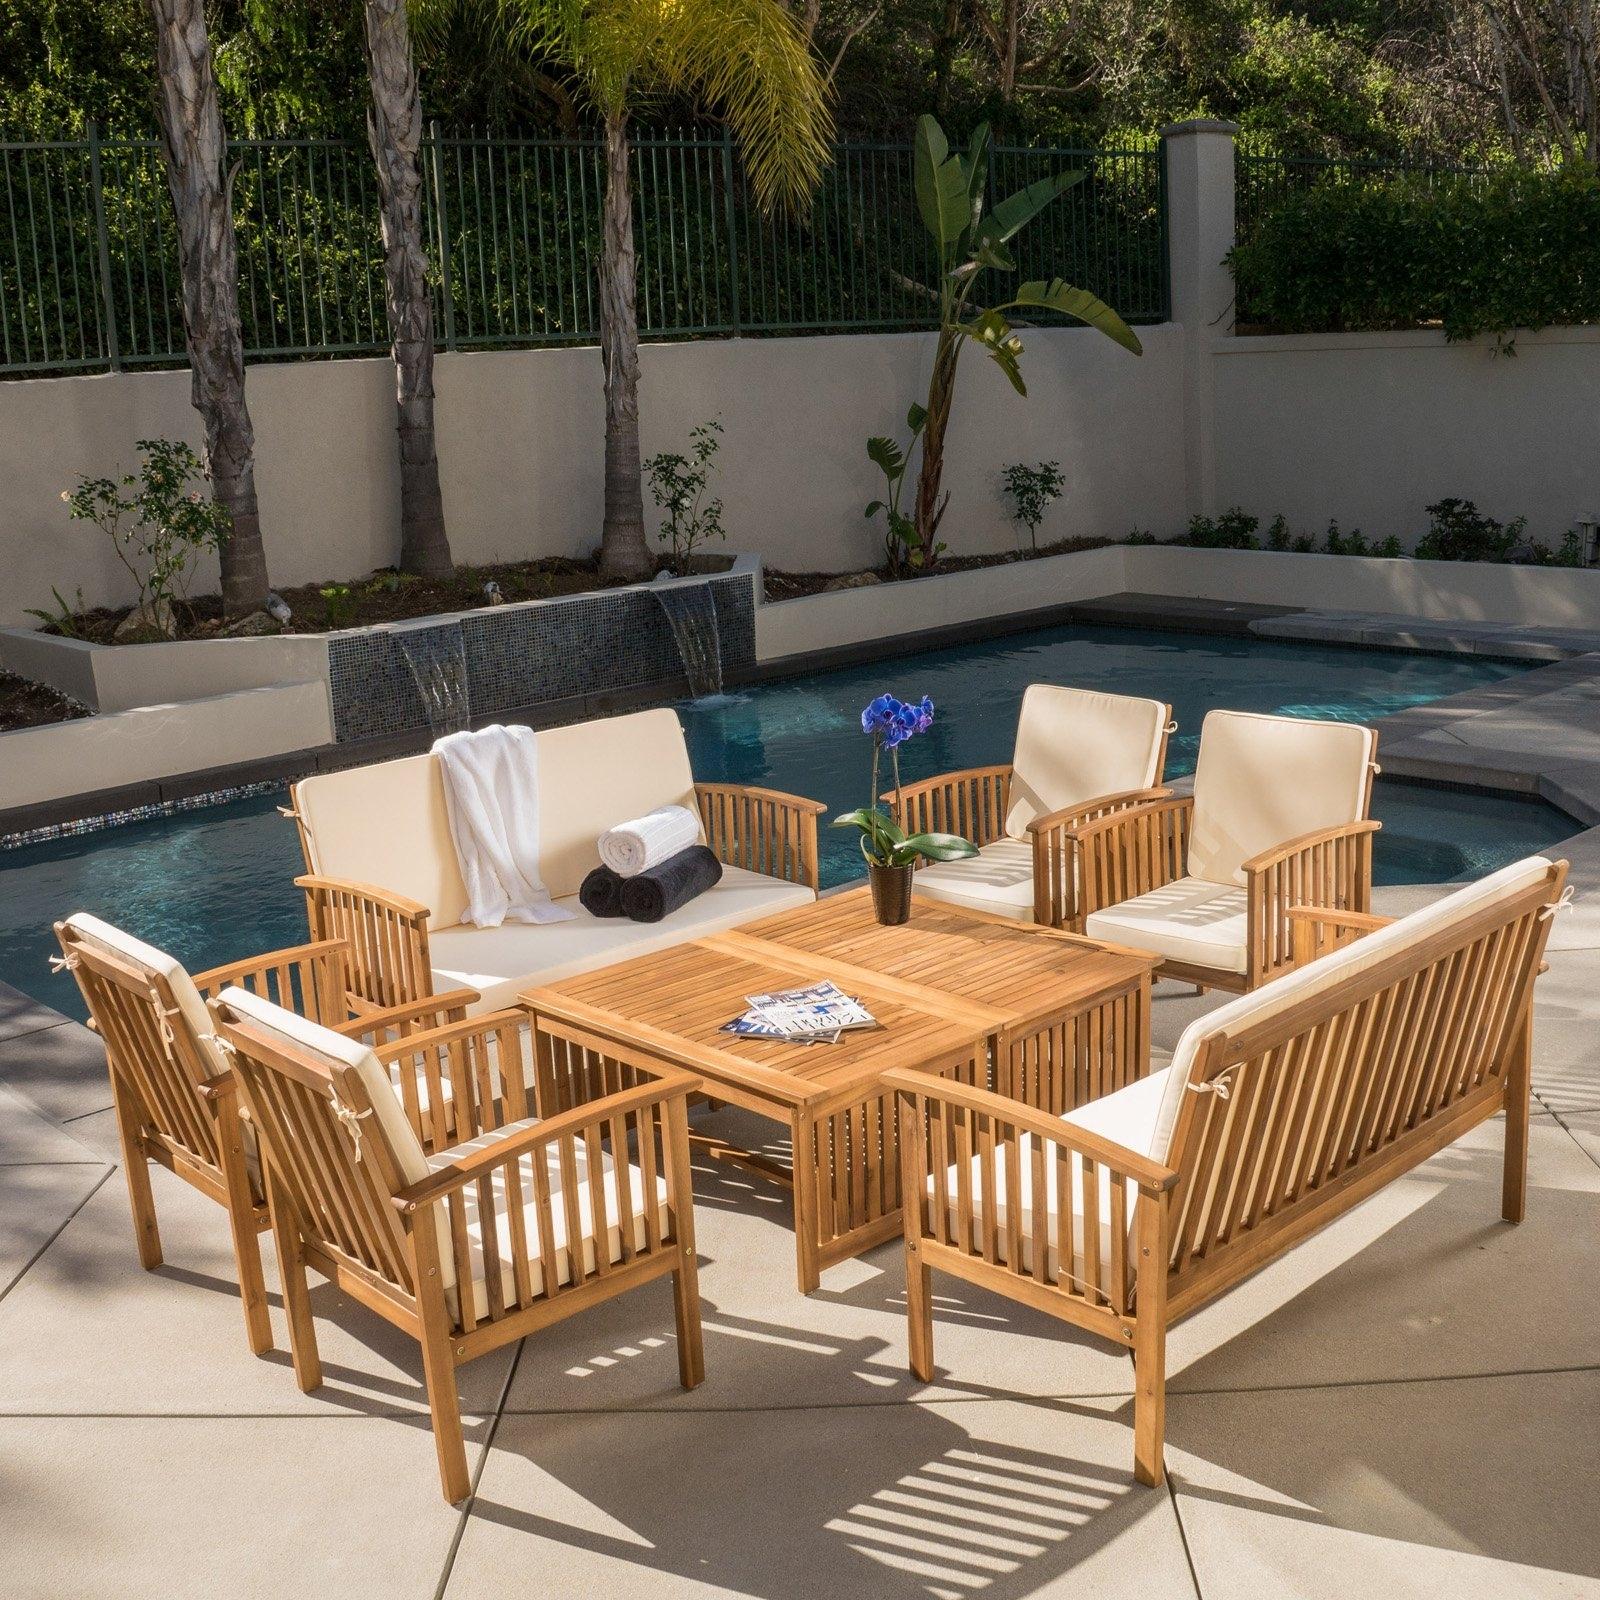 Most Popular Wood Patio Furniture Conversation Sets Within Hayak 8 Piece Conversation Set – Walmart (View 5 of 20)